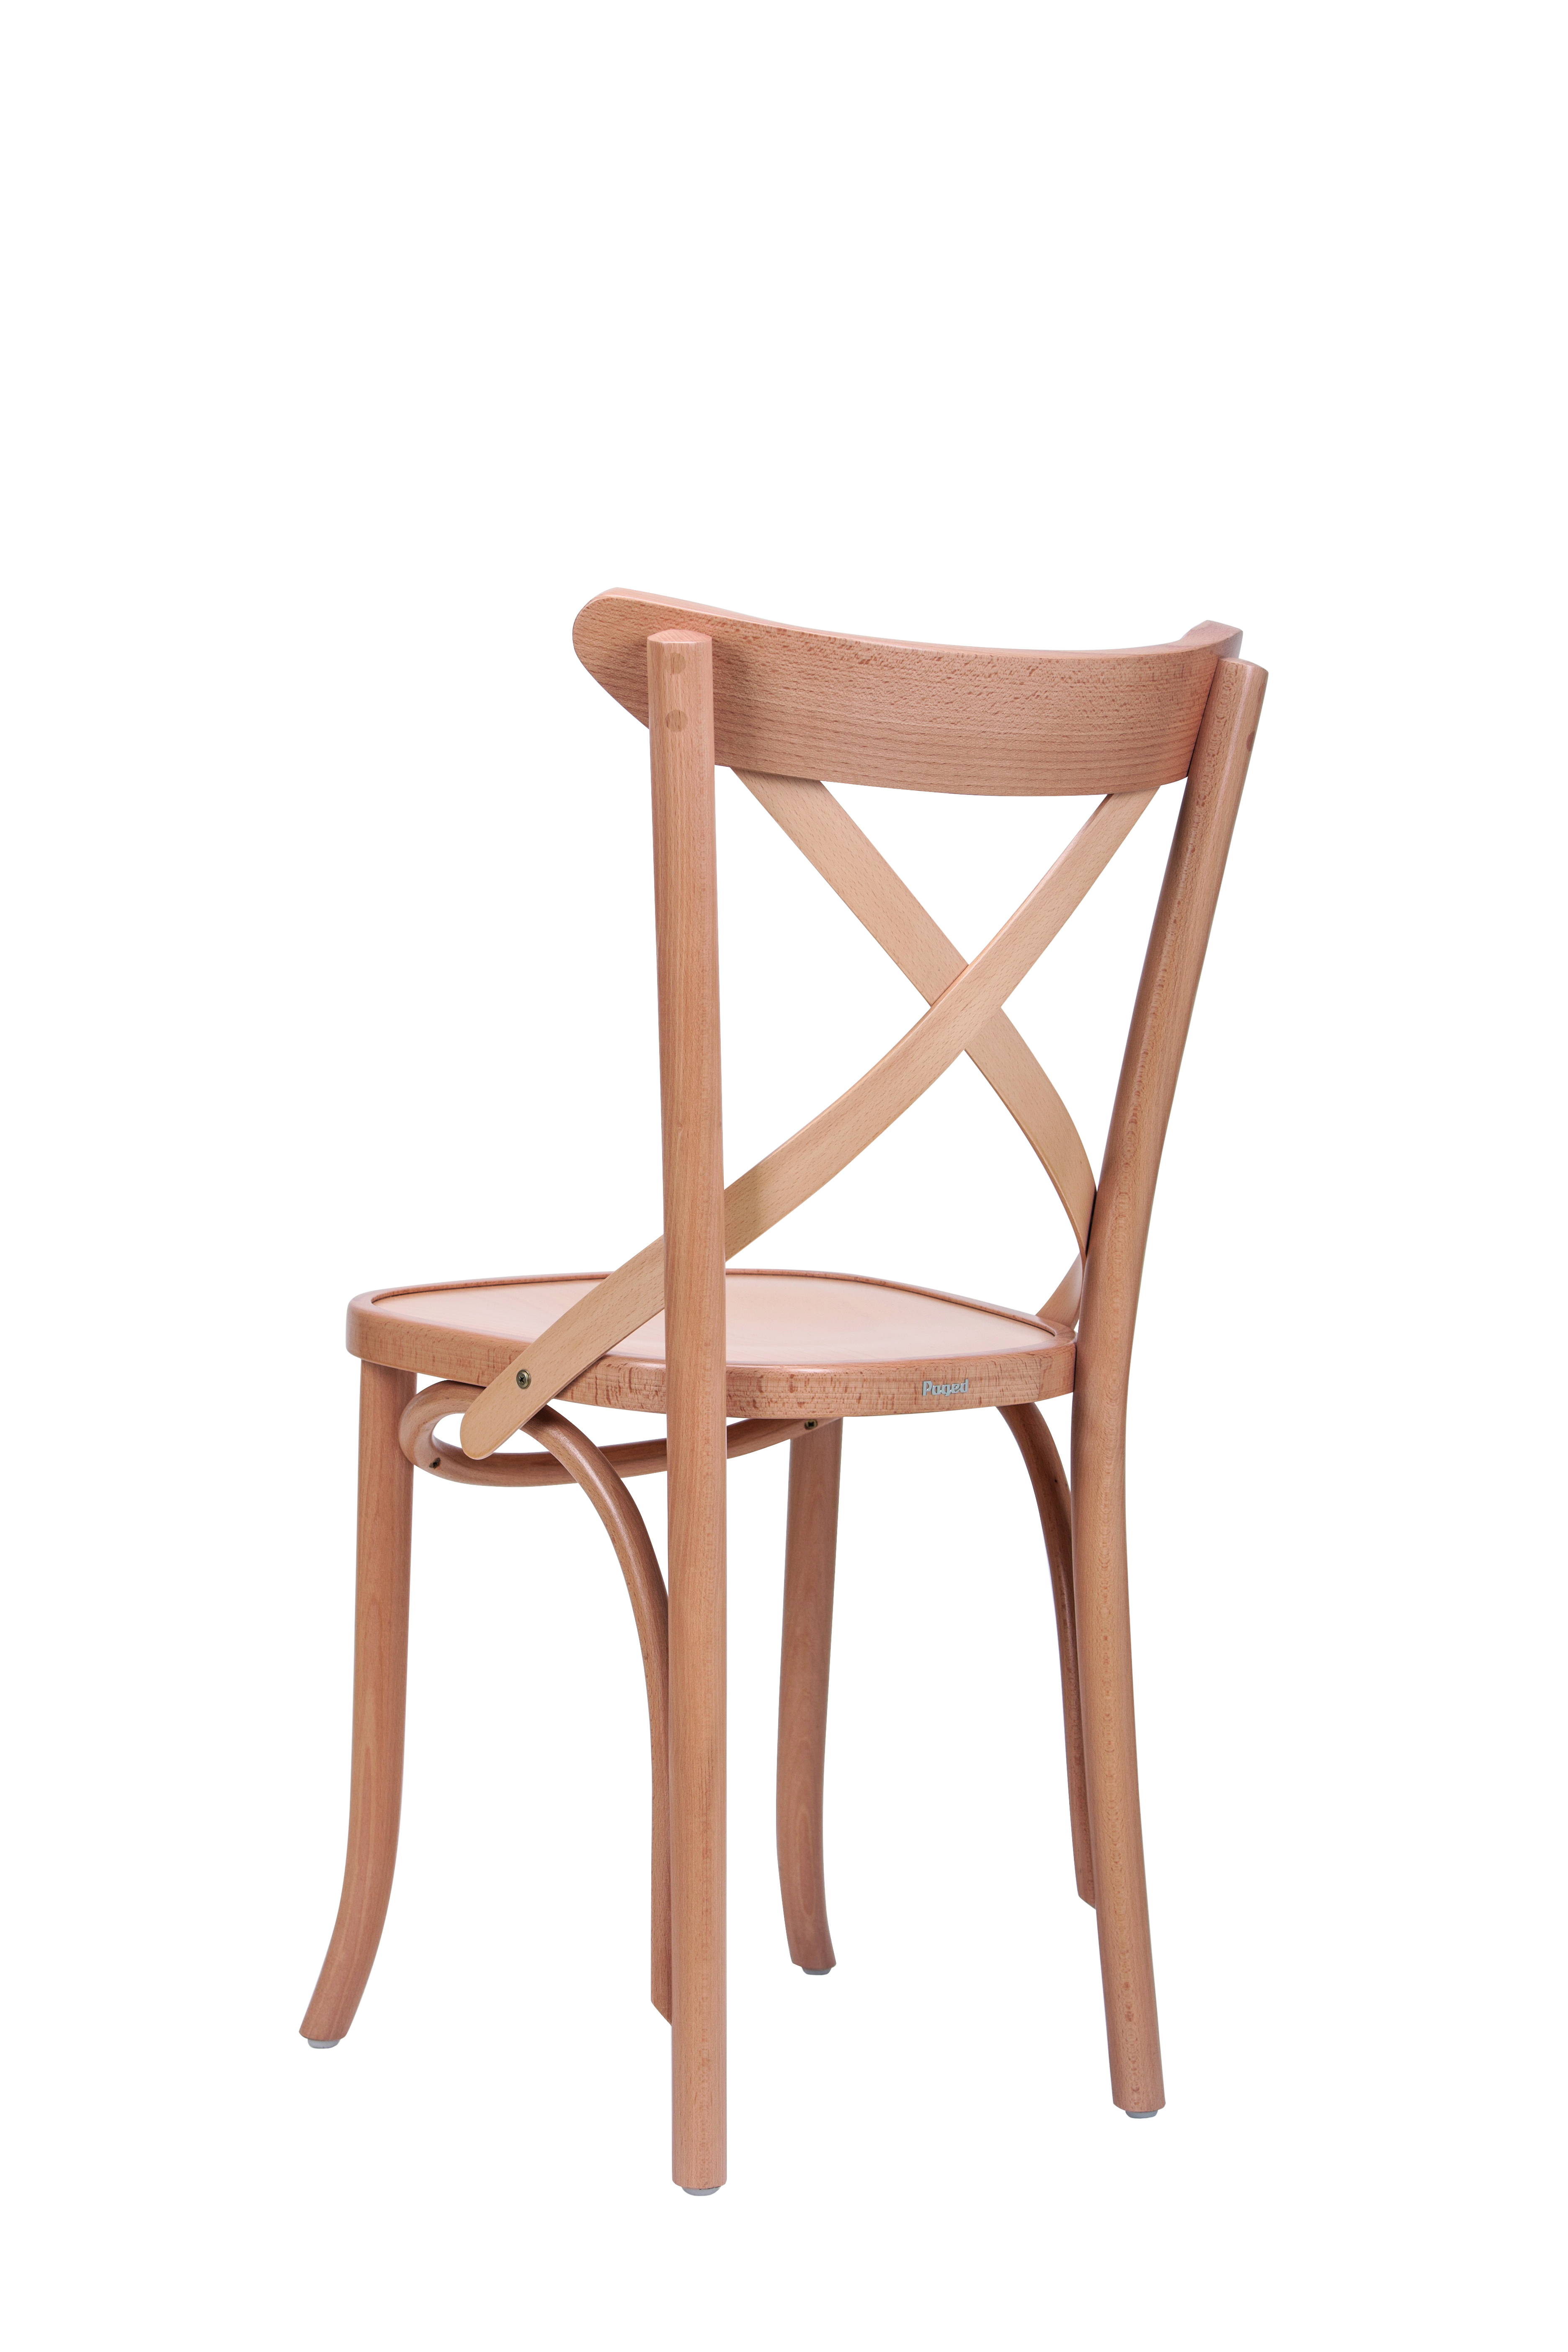 stol pl-1230a - b u00d6jtr u00c4  u0026 pinnstolar - tr u00e4stolar